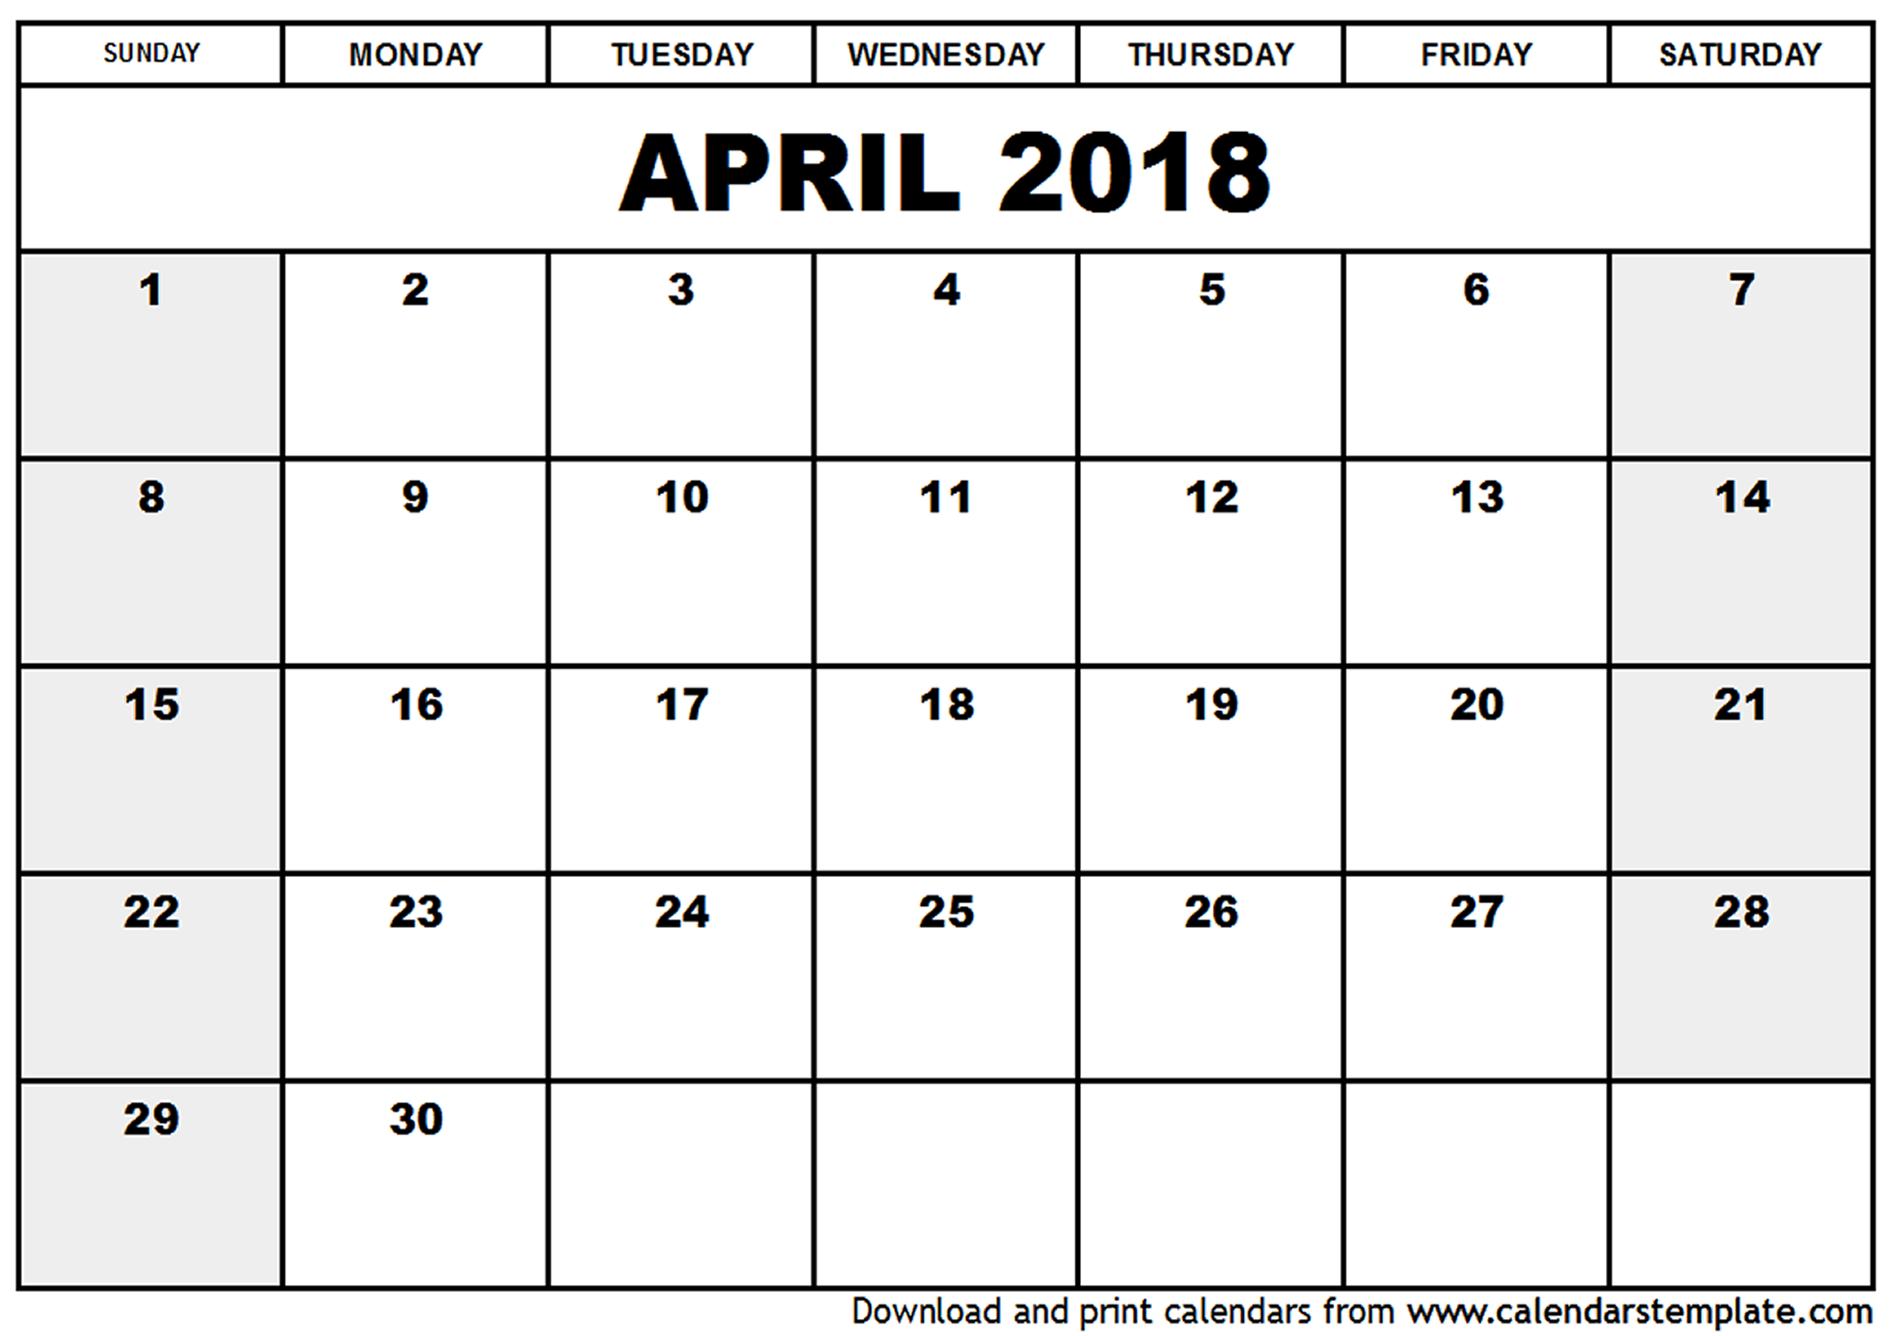 blank calendar template april 2018 Ideal.vistalist.co